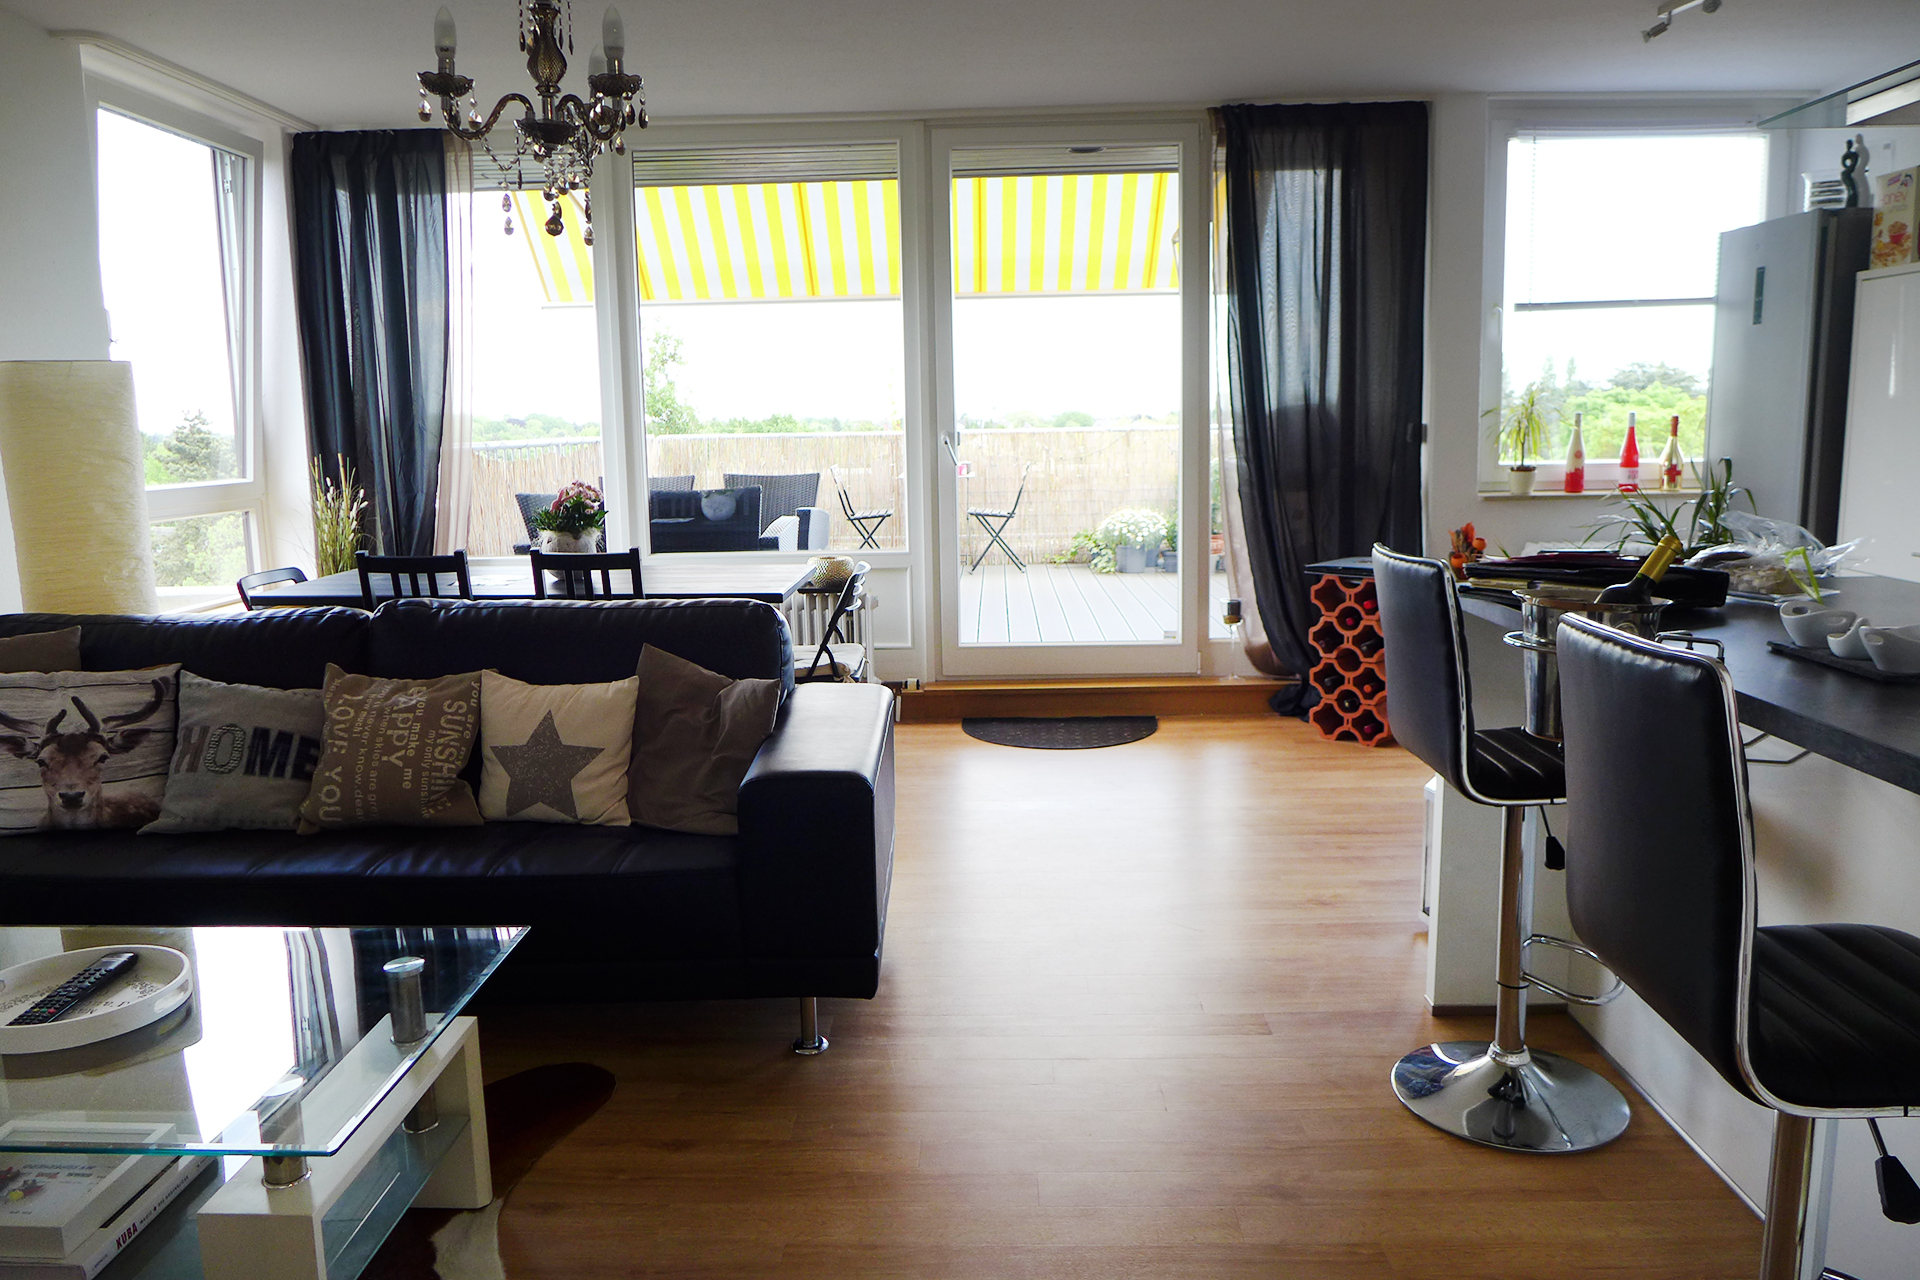 2-Zimmer-Wohnung | Meerbusch-Büderich